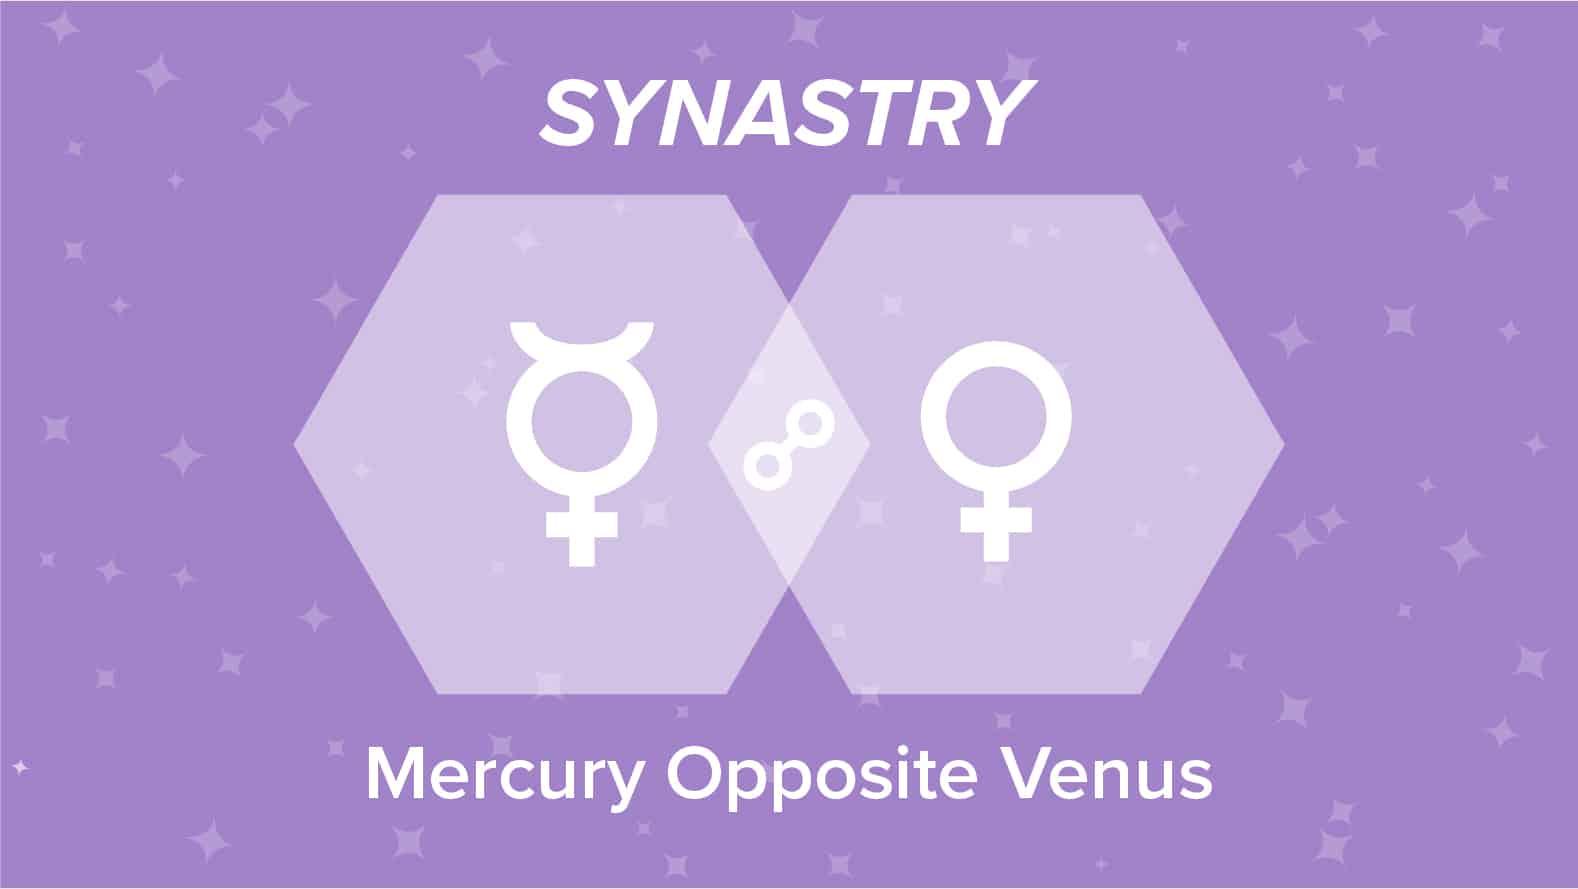 Mercury Opposite Venus Synastry